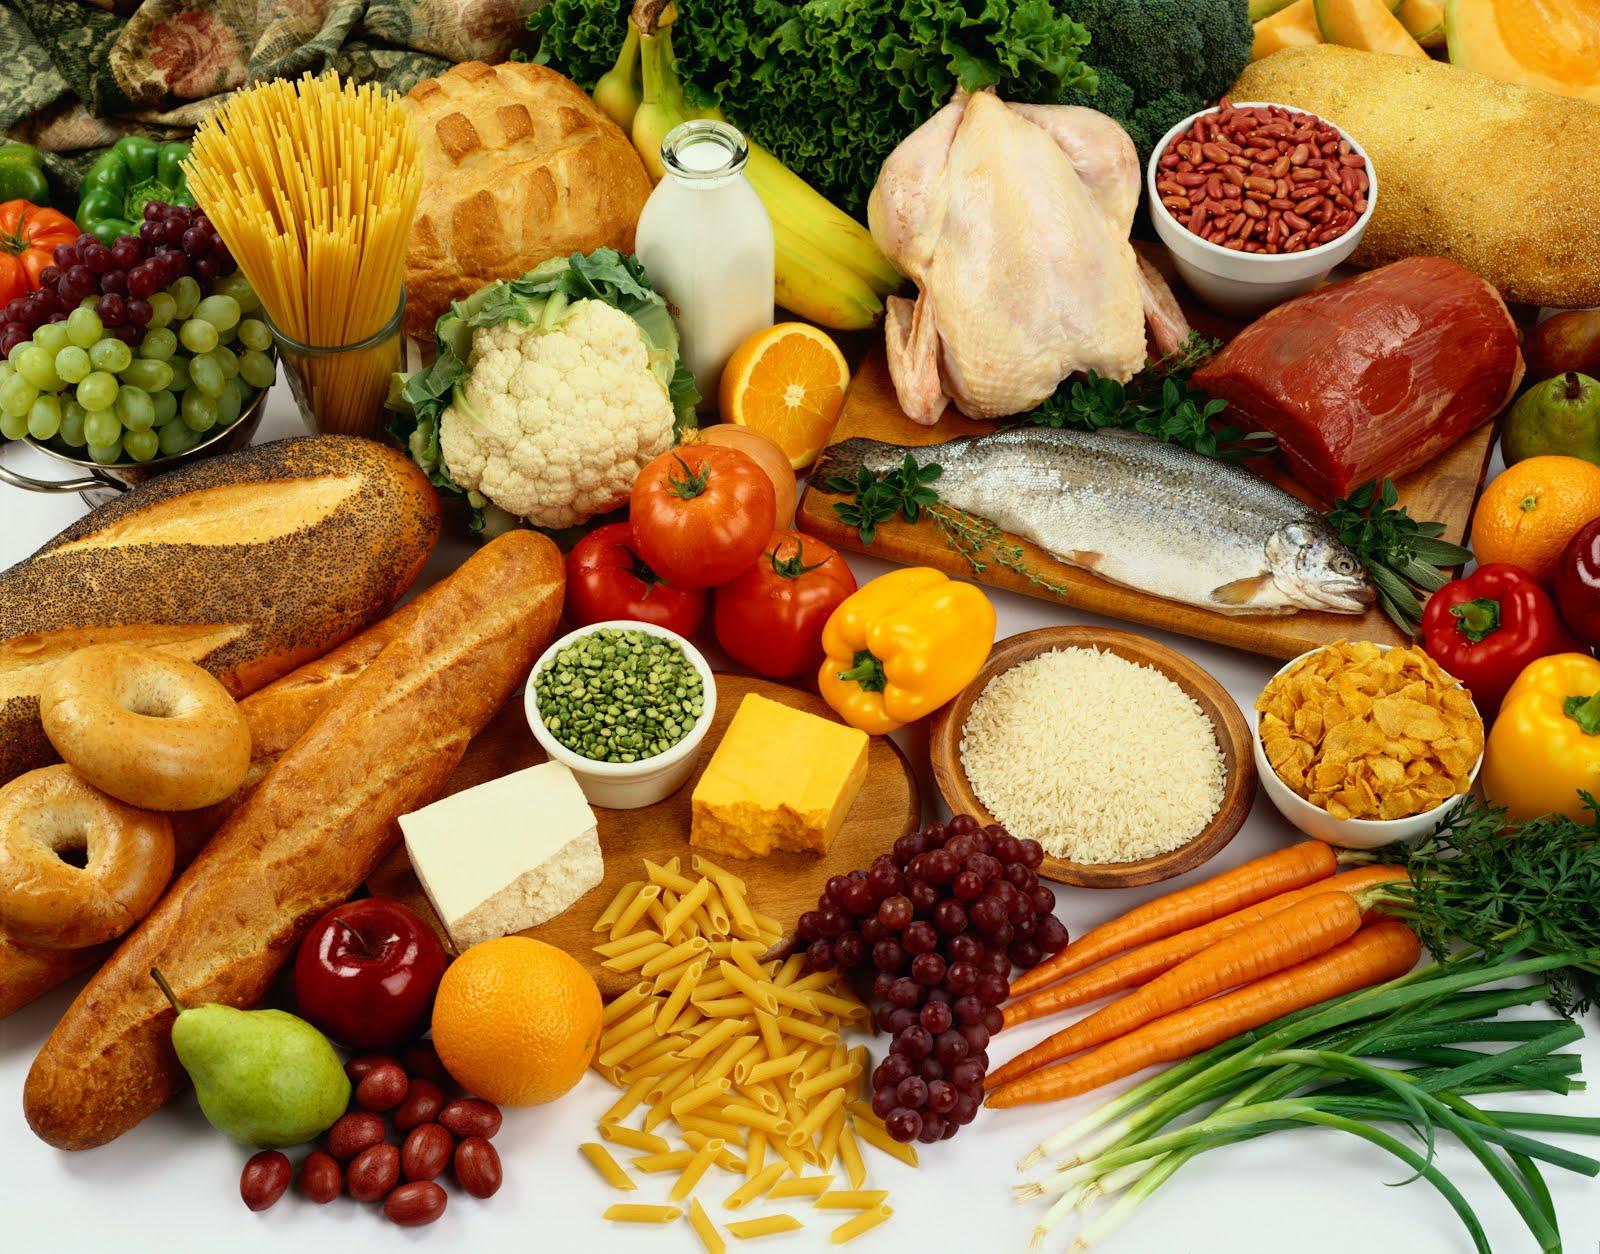 FOOD FOOD GLORIOUS FOOD ….